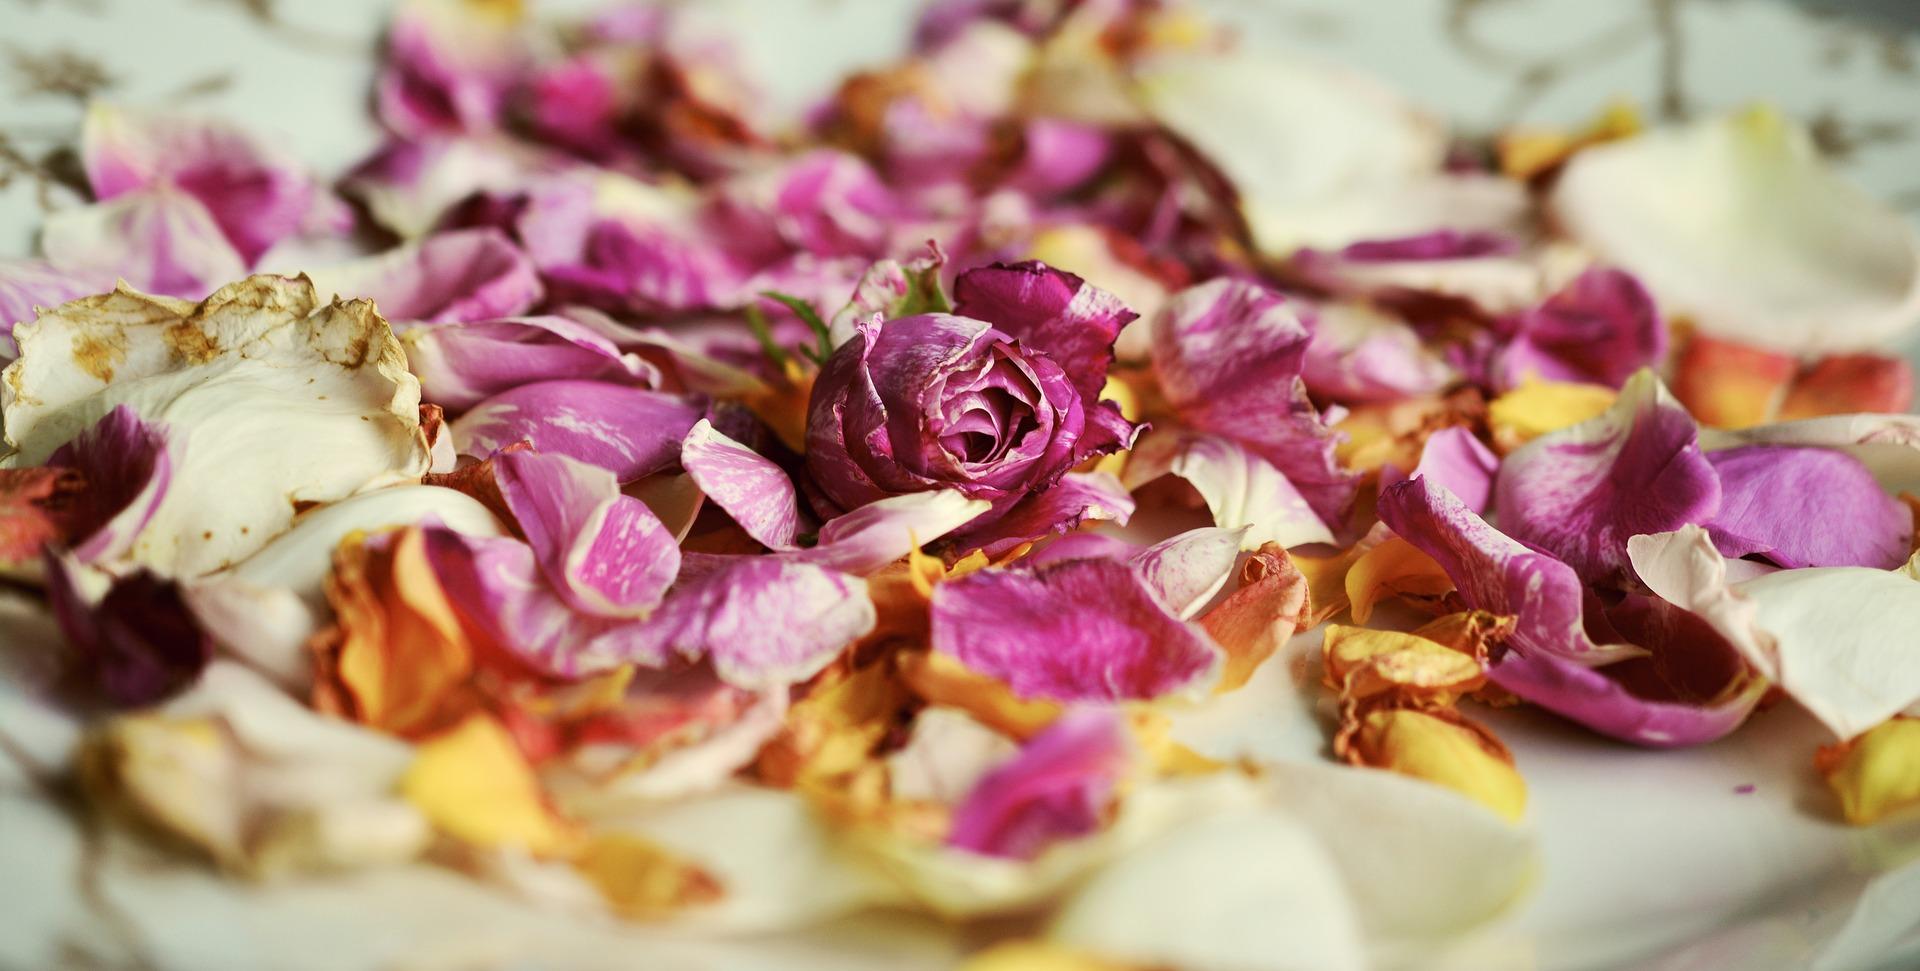 rose-petals-2446716_1920.jpg